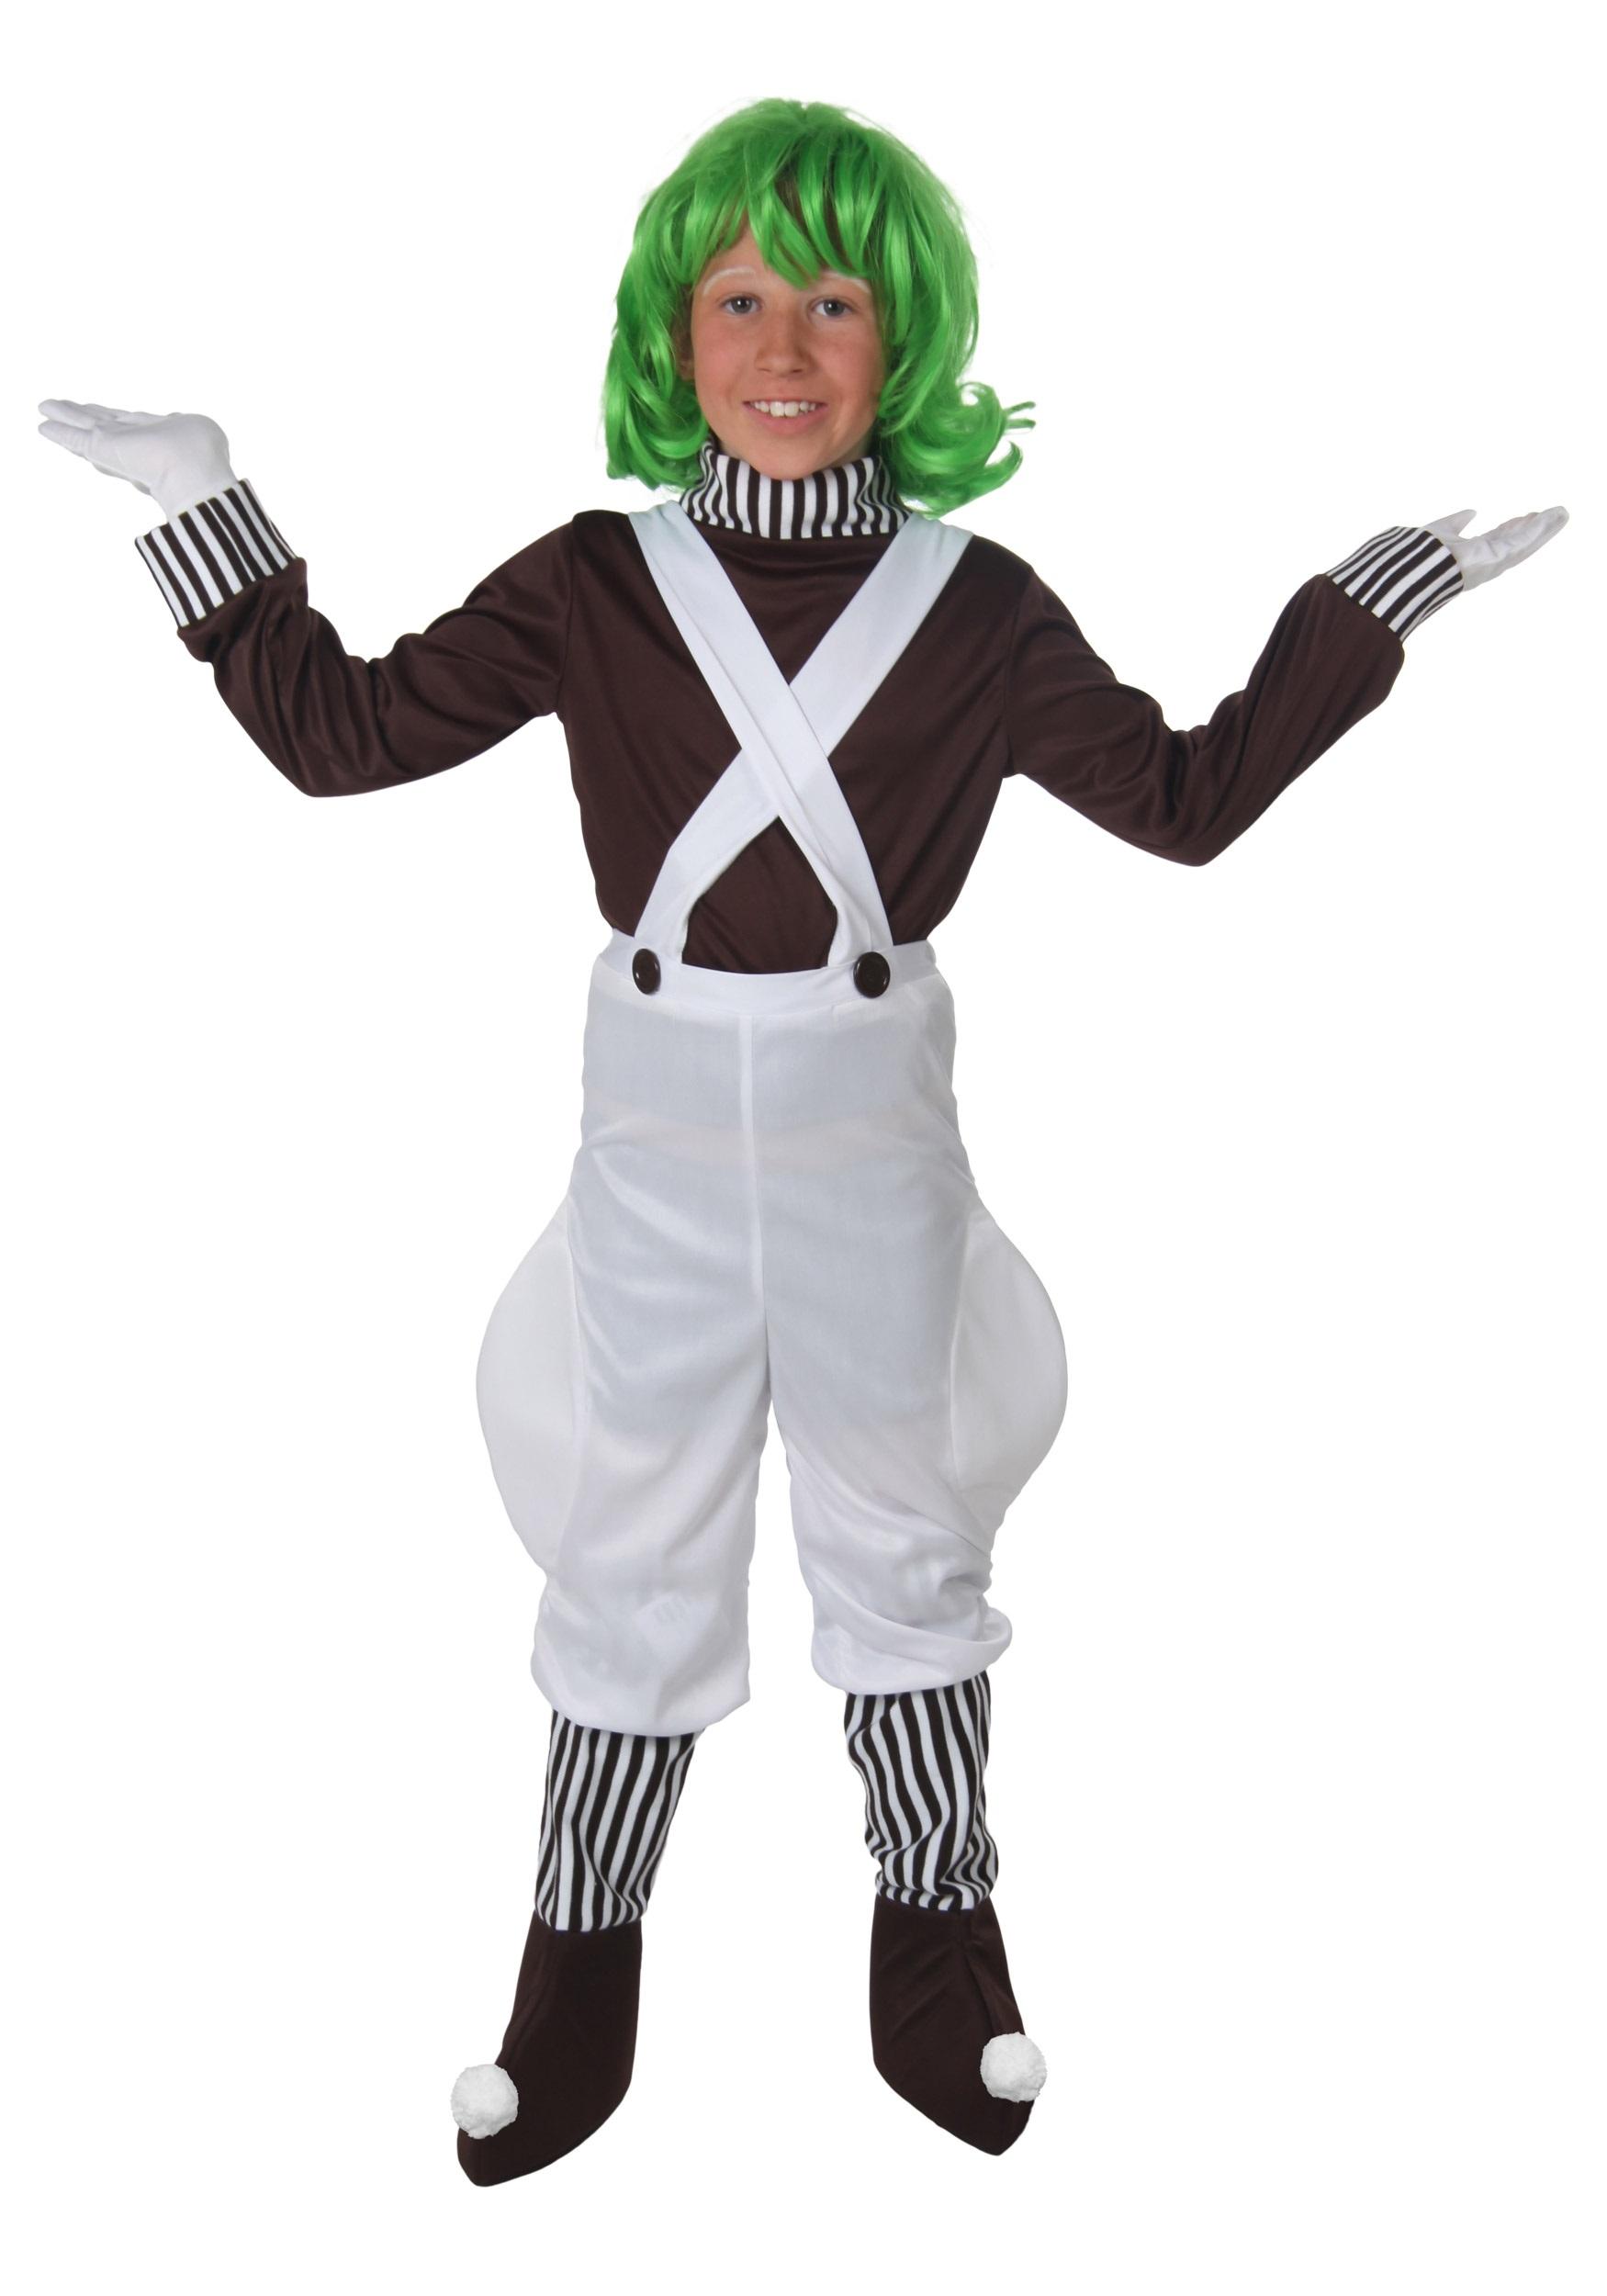 Chocolate Factory Worker Kids Costume